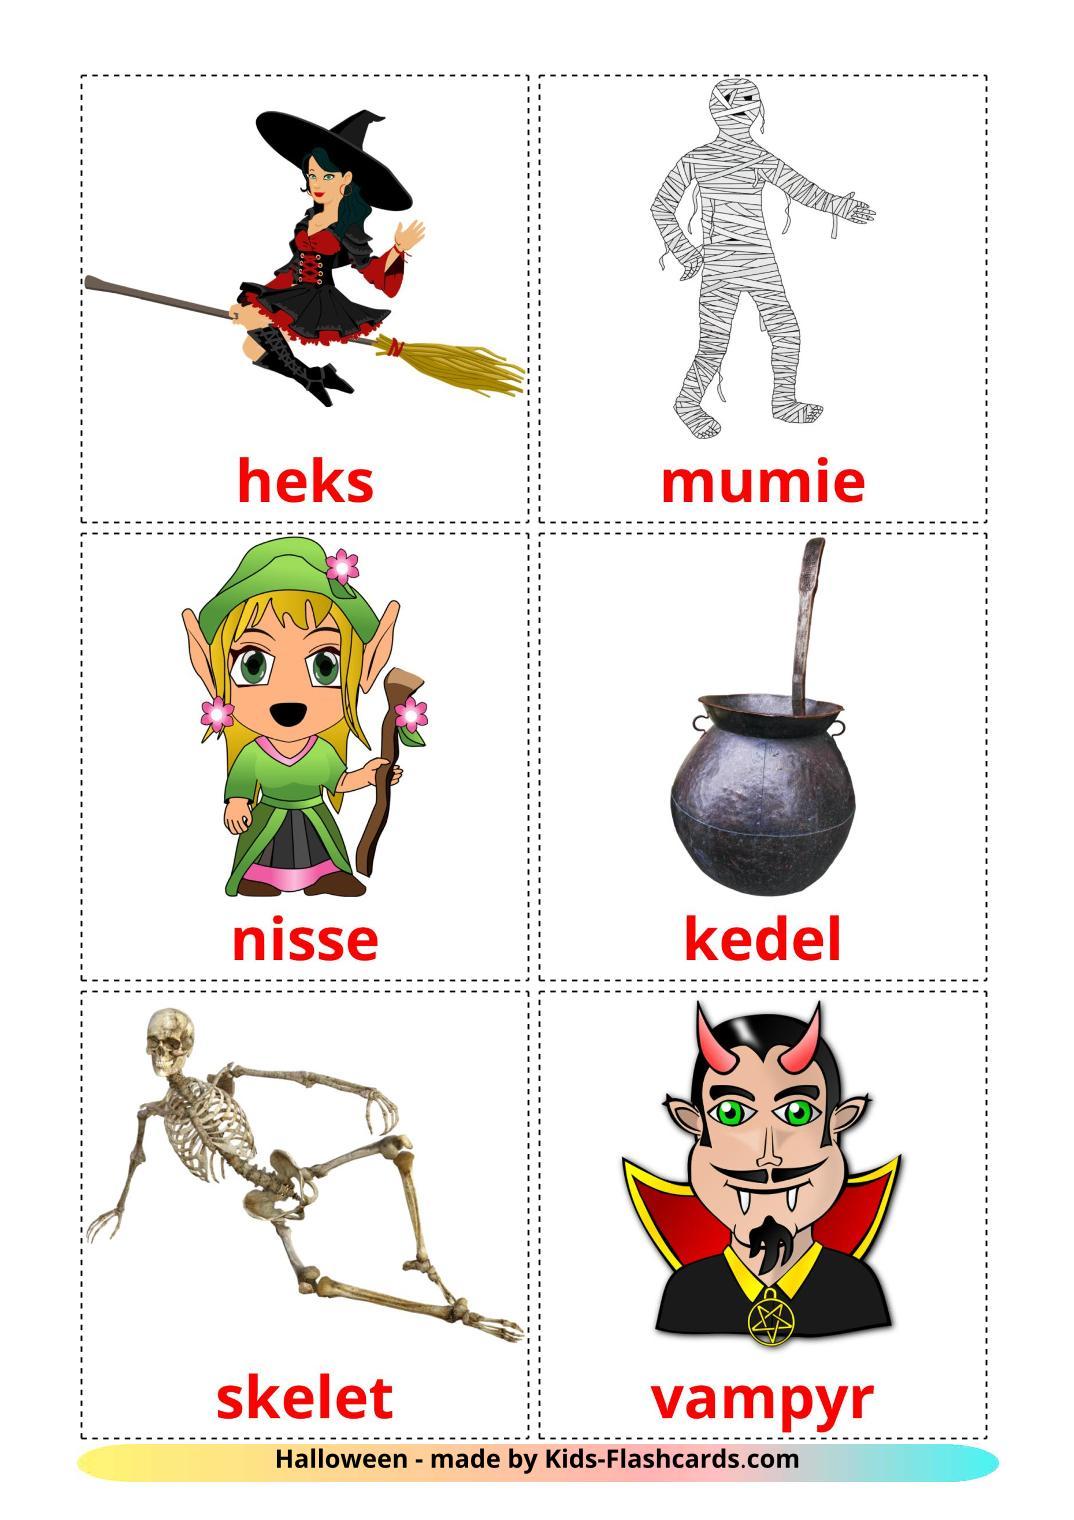 Halloween - 16 Free Printable dansk Flashcards